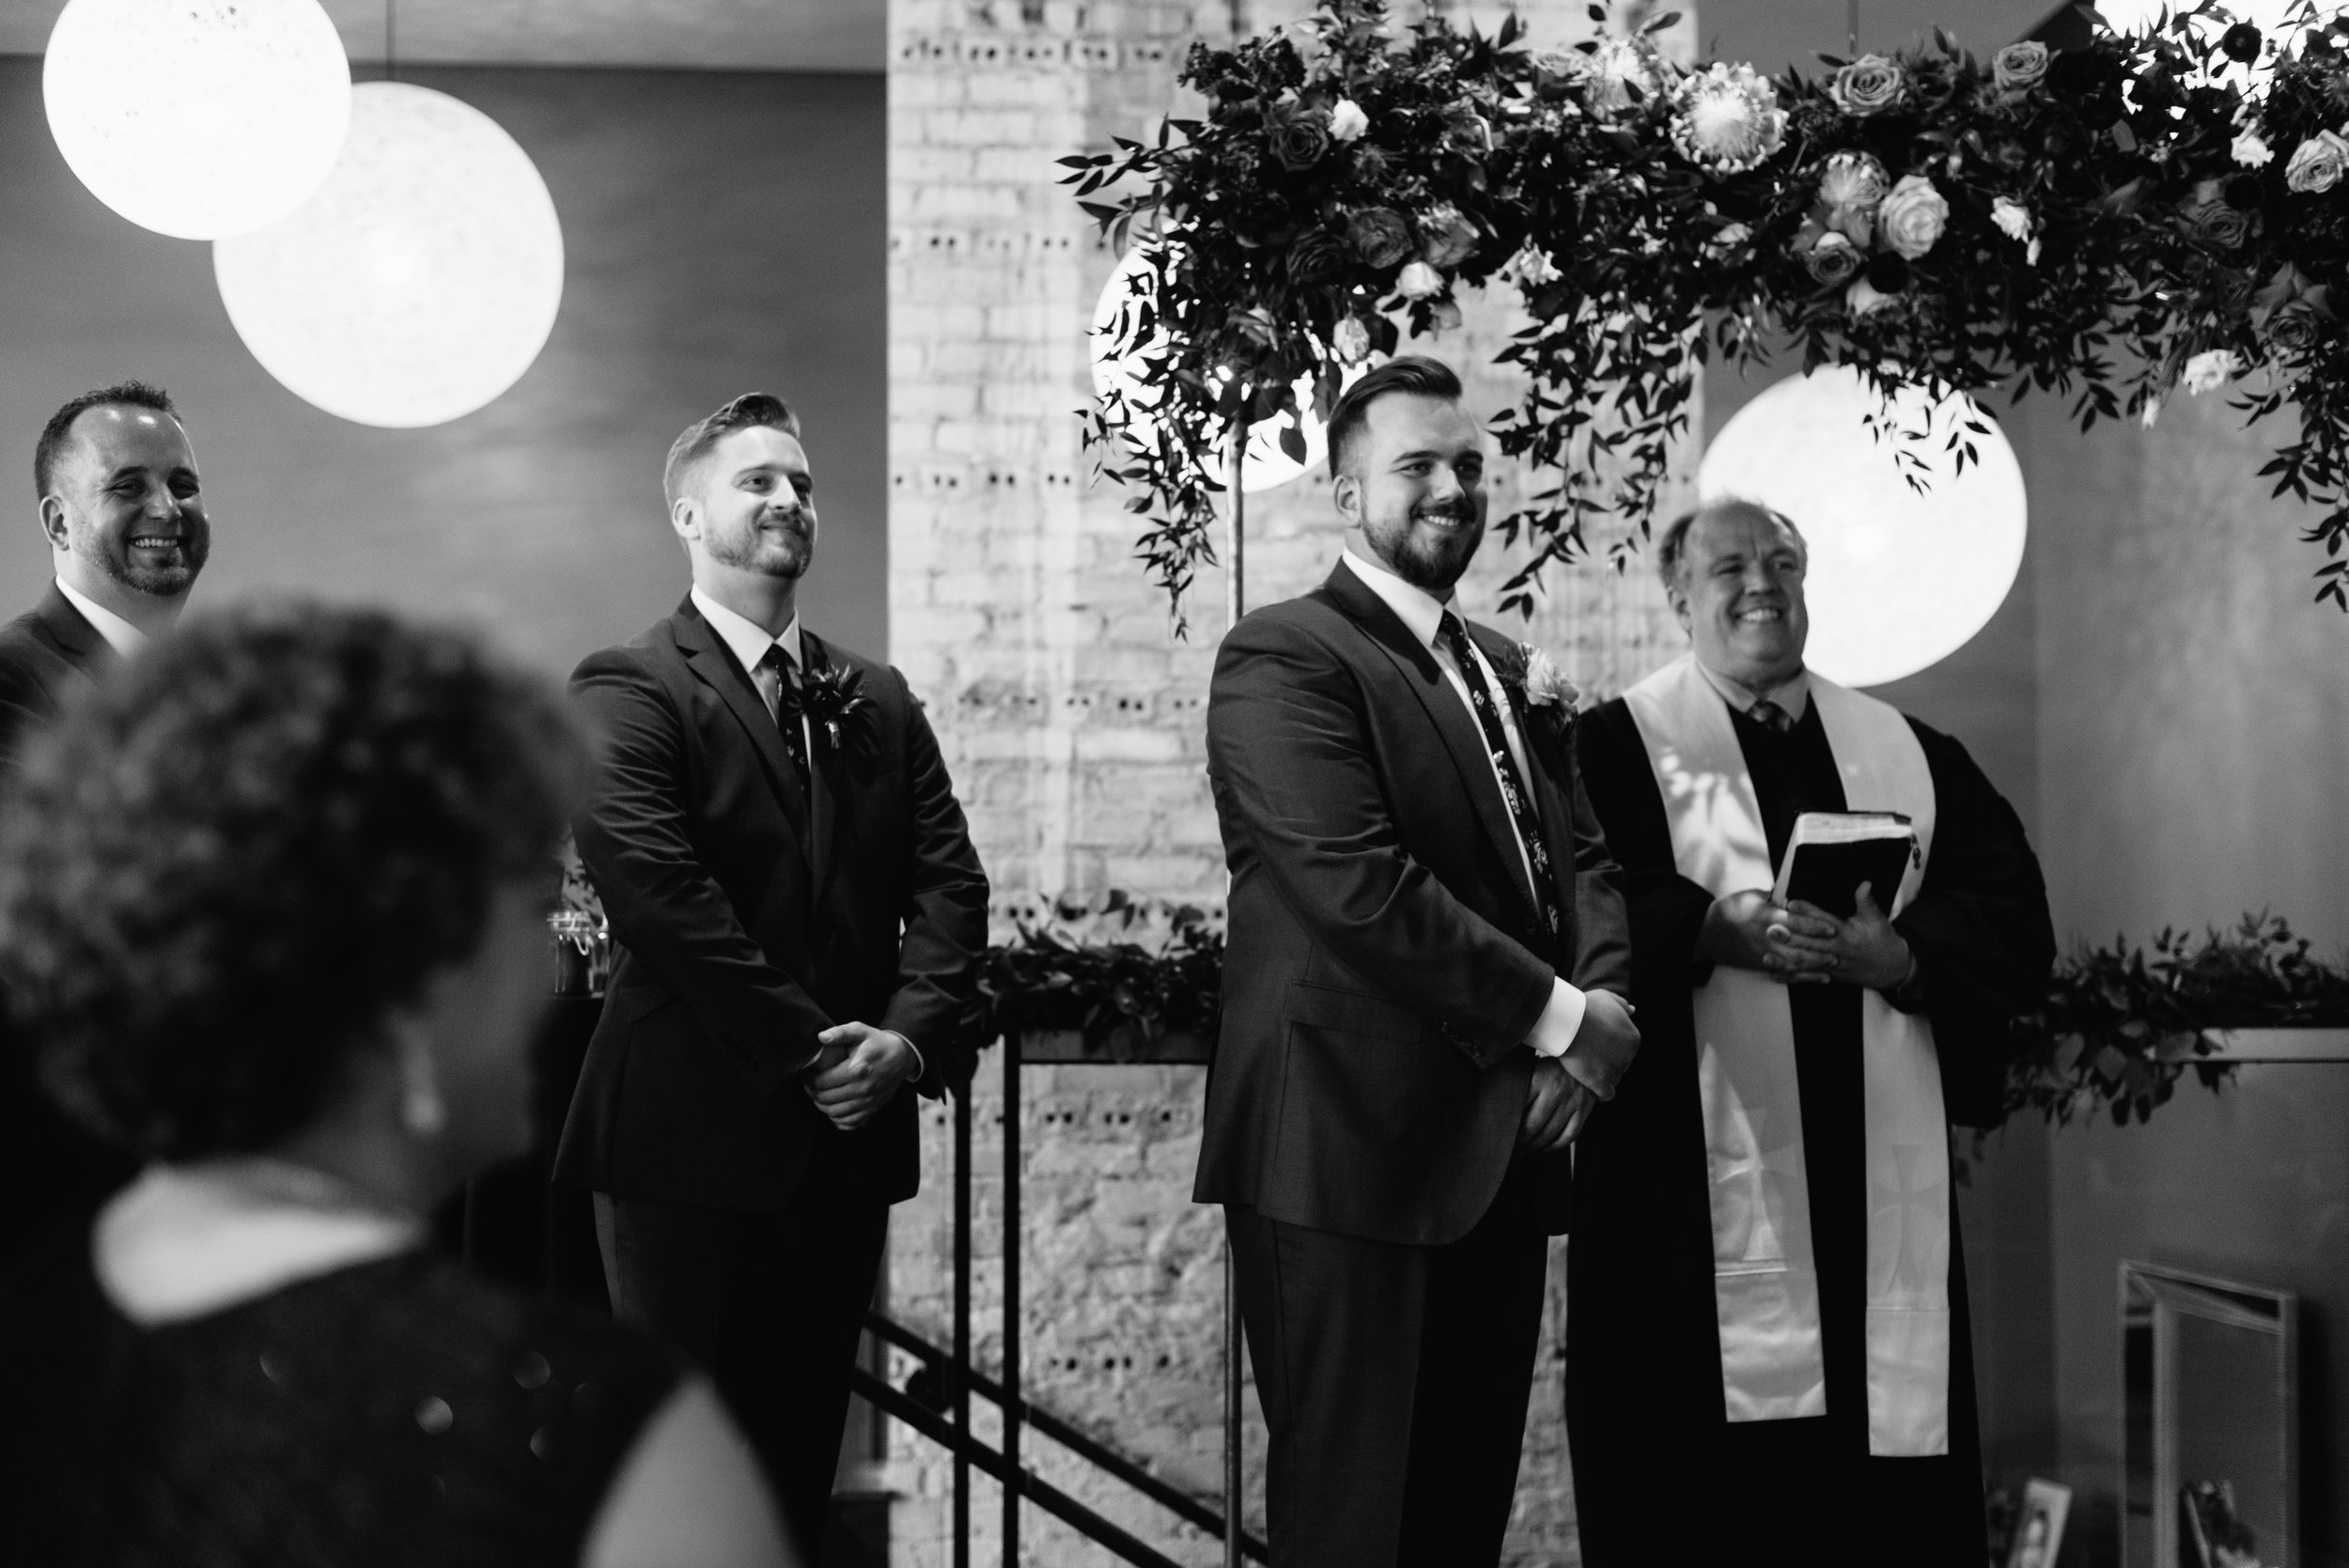 industrial-wedding-minneapolis-photographer-1-12.jpg